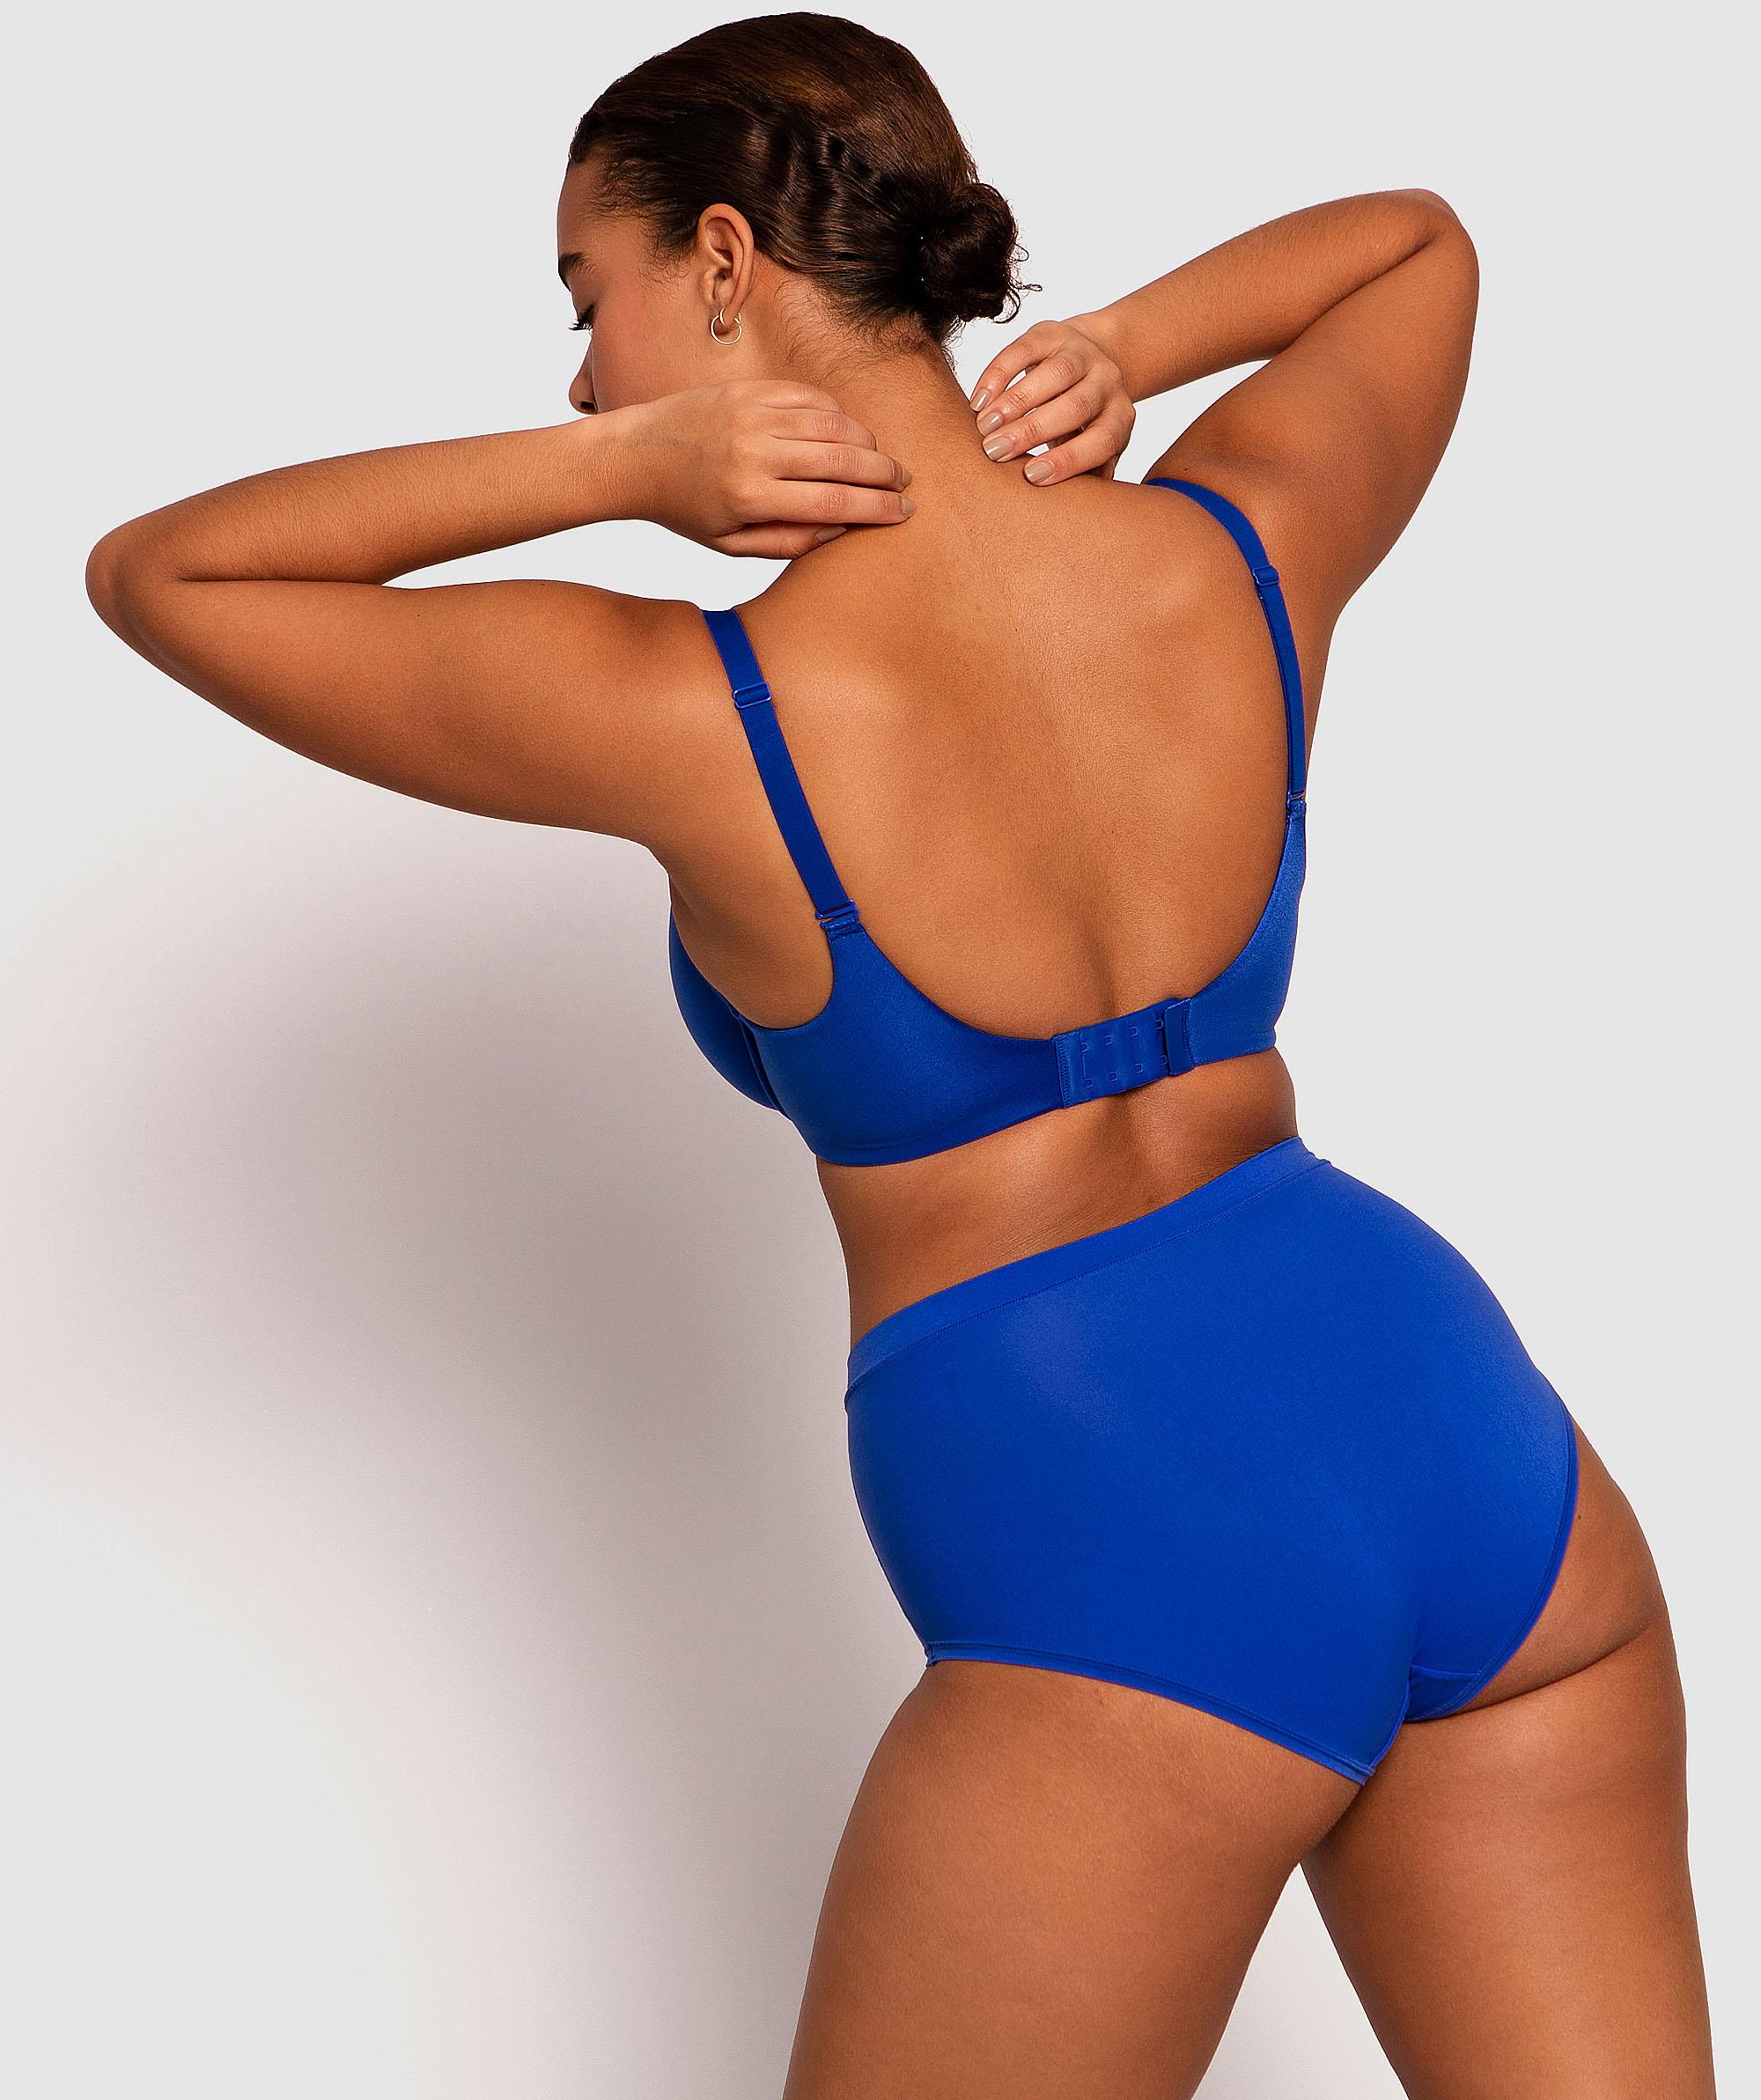 Body Bliss 2nd Gen Full Brief Panty - Dark Blue